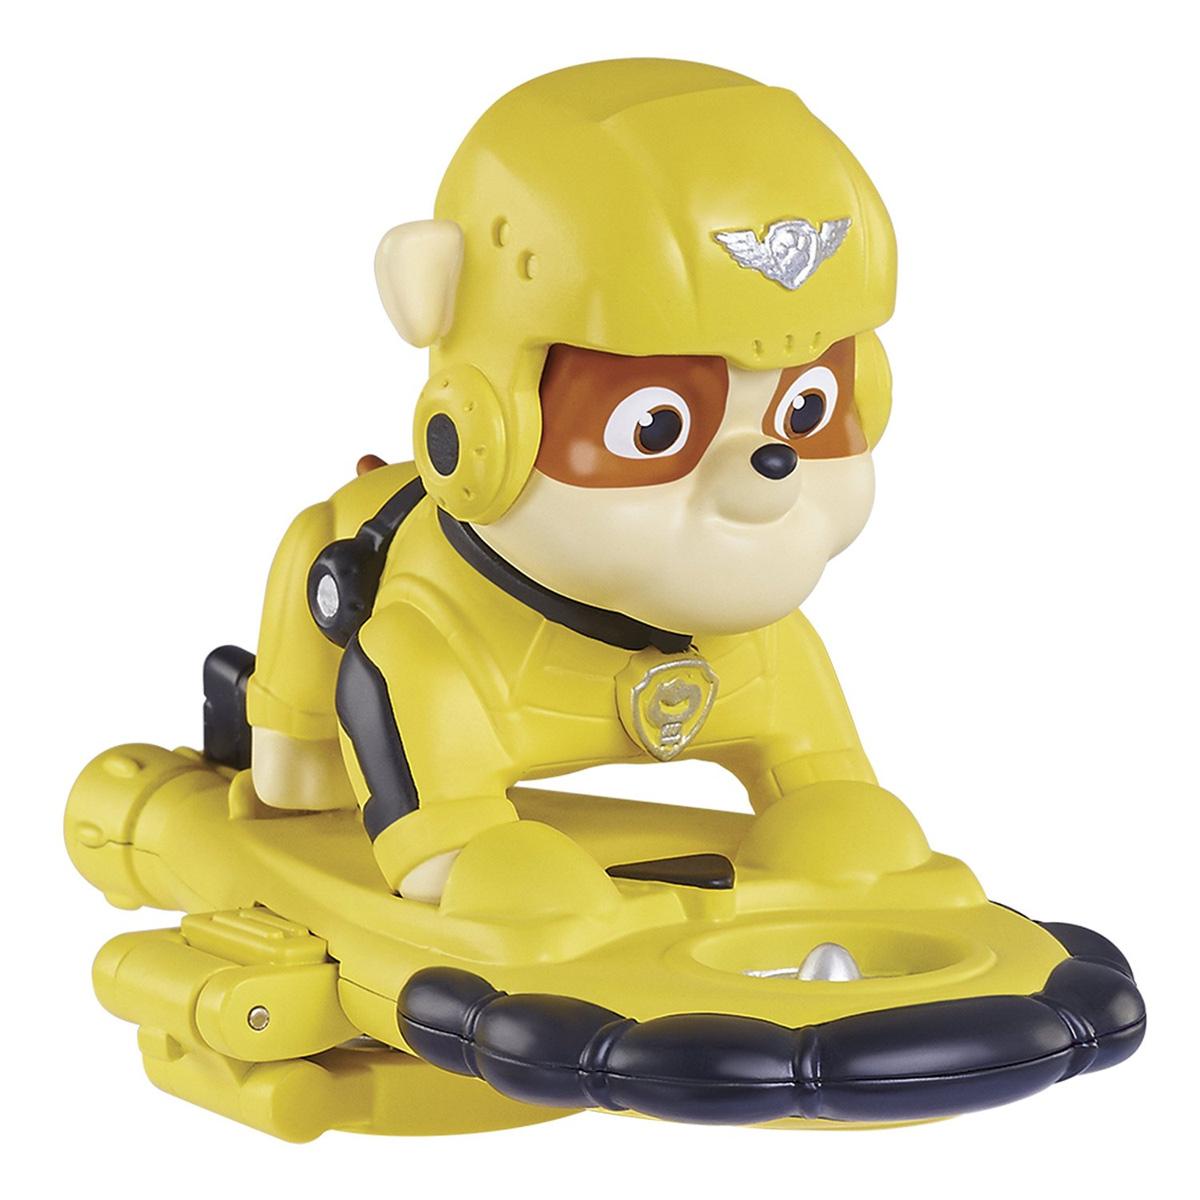 Paw Patrol Фигурка Воздушный спасатель Крепыш